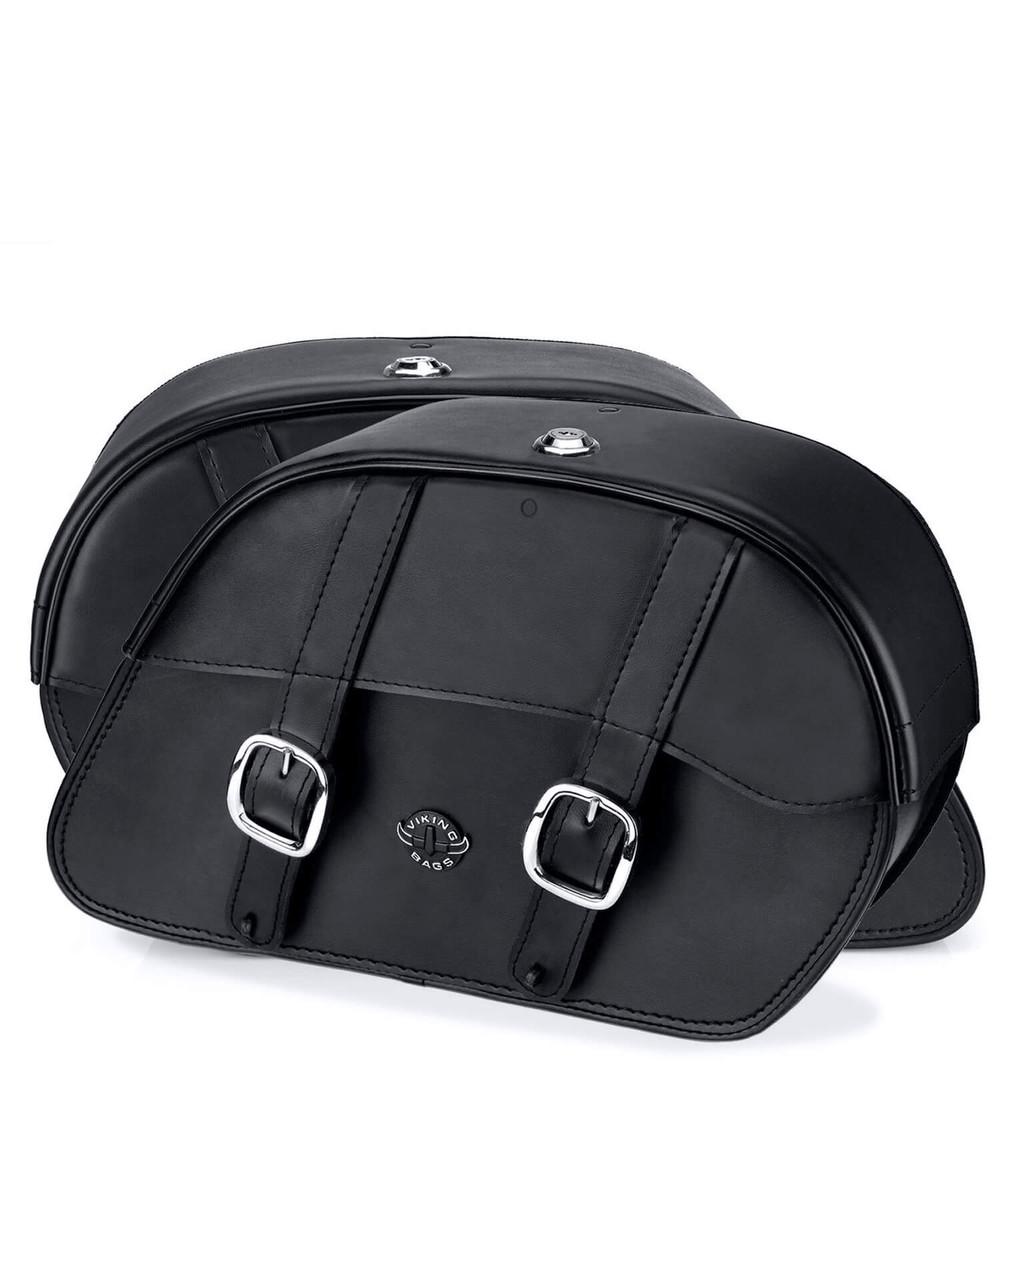 Honda Rebel 500 Shock Shock Cutout Slanted Large Motorcycle Saddlebags Both Bags View